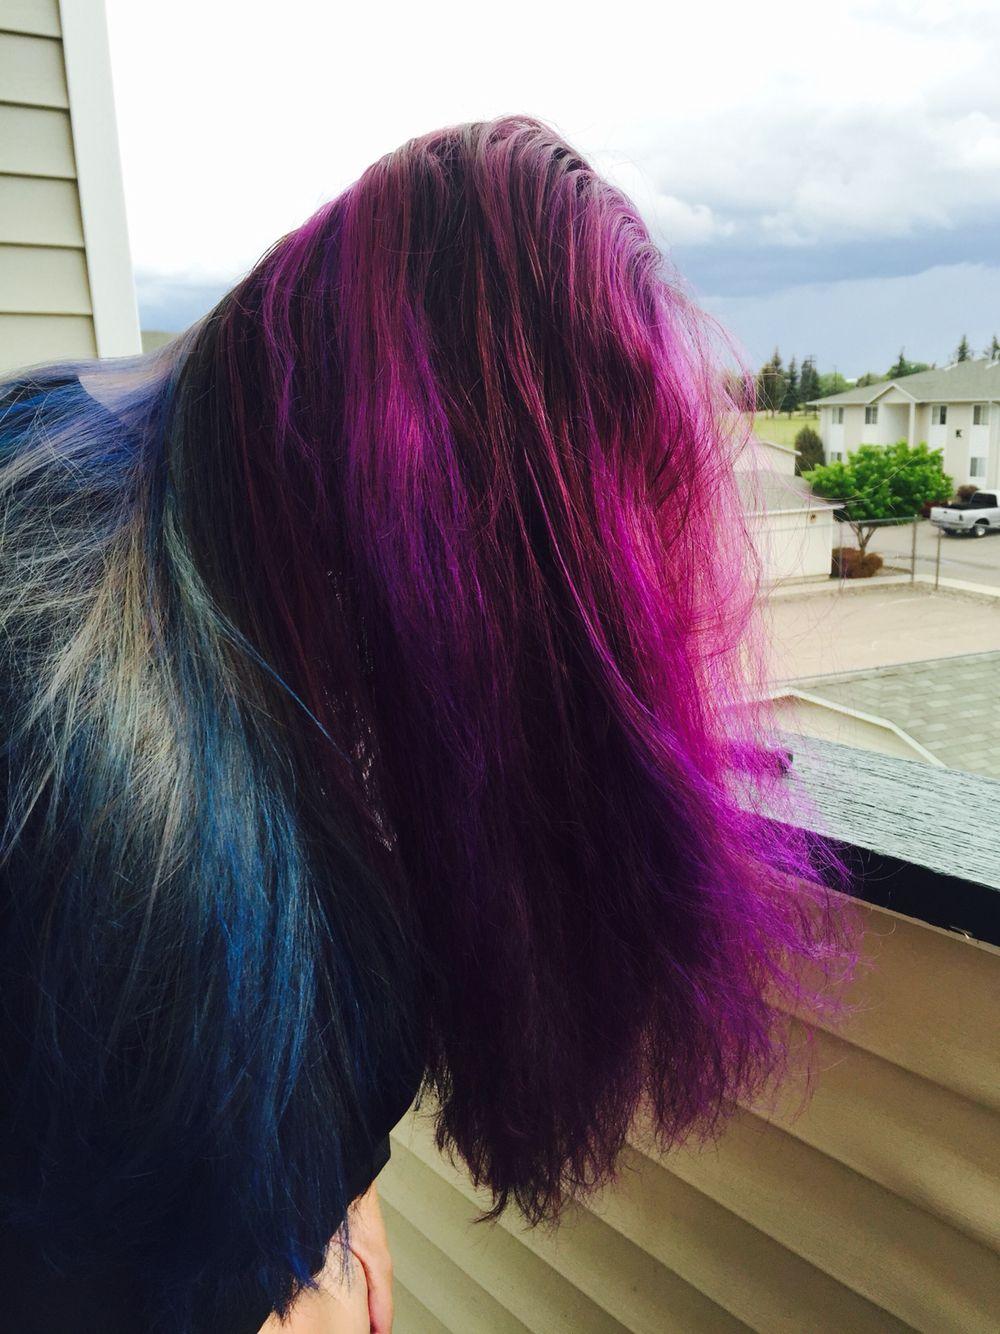 My latest colors. Simple Splat colors. ) Splat hair dye